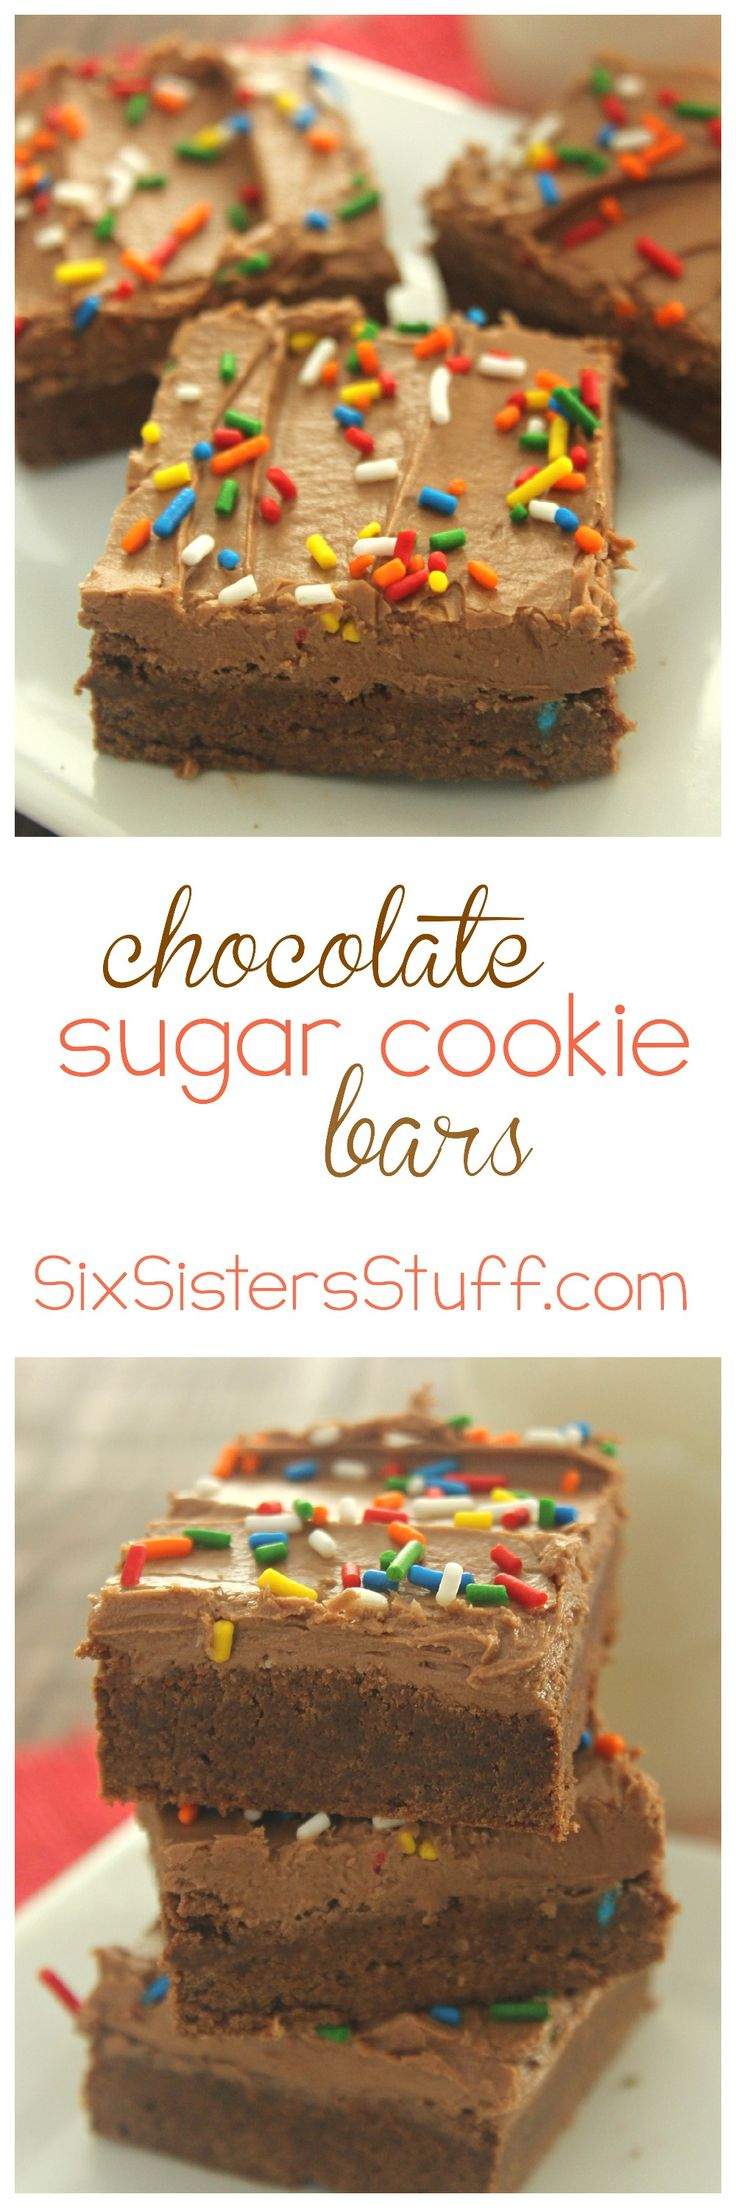 Chocolate Sugar Cookie Bars on SixSistersStuff.com